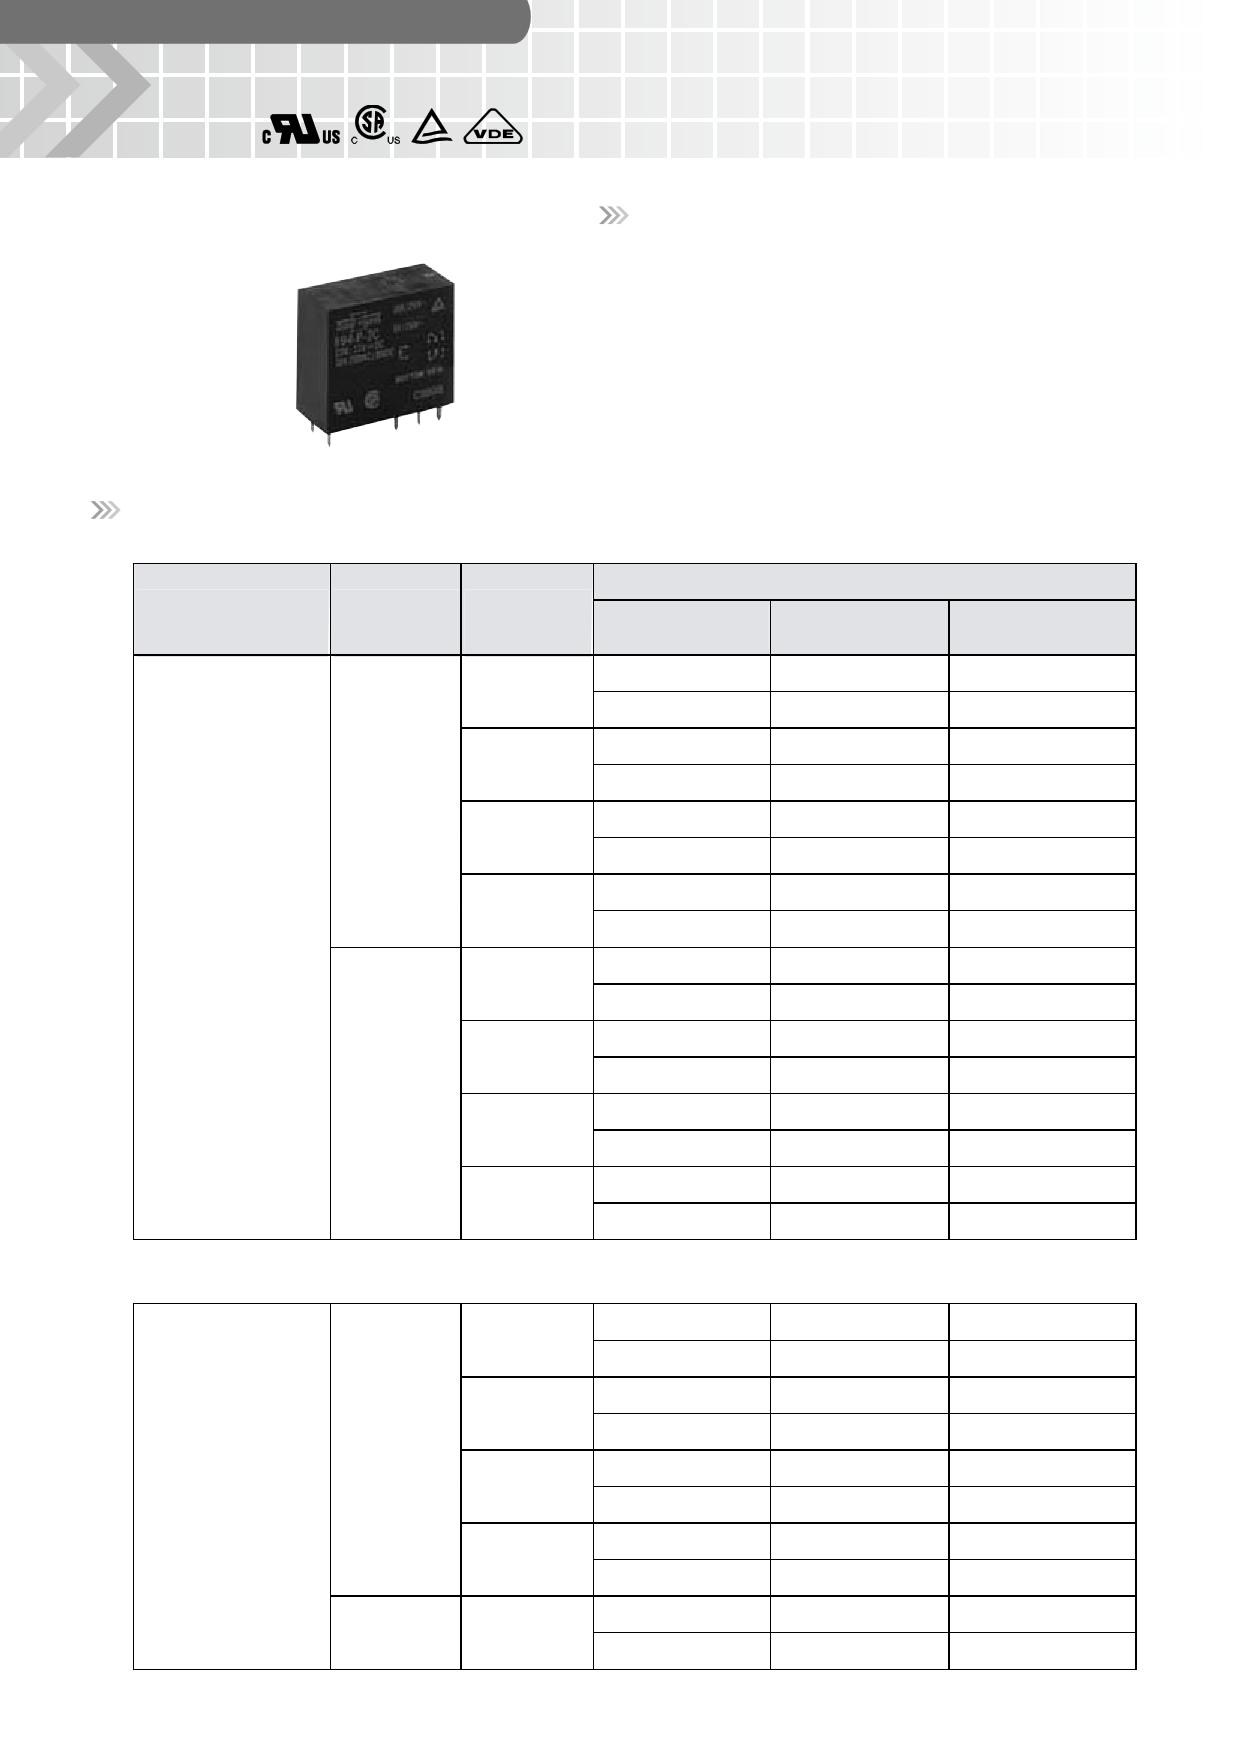 894-2ACA1-F-S Datasheet, 894-2ACA1-F-S PDF,ピン配置, 機能